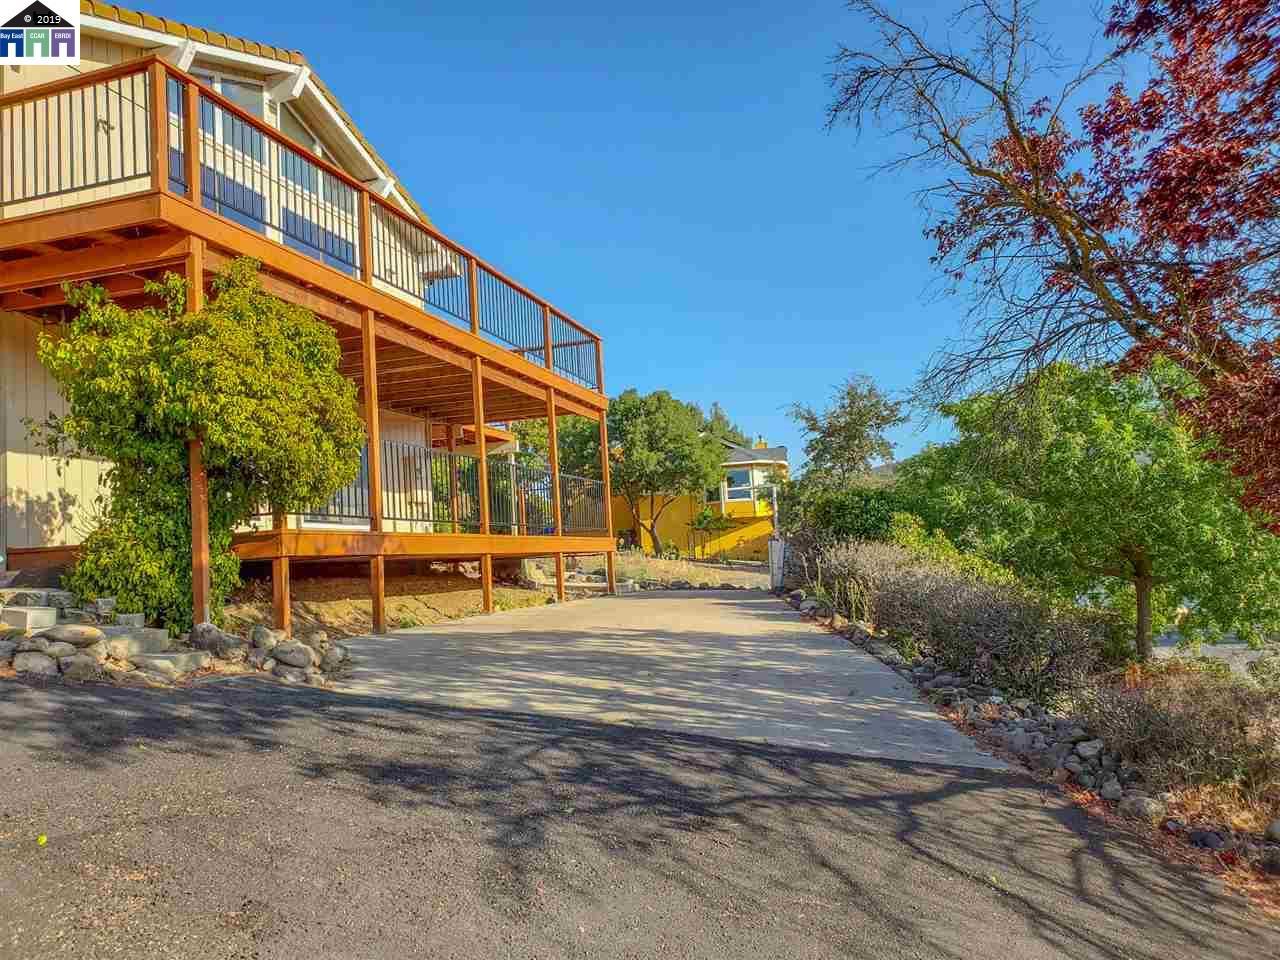 591 Poker Flat Road Copperopolis, CA 95228